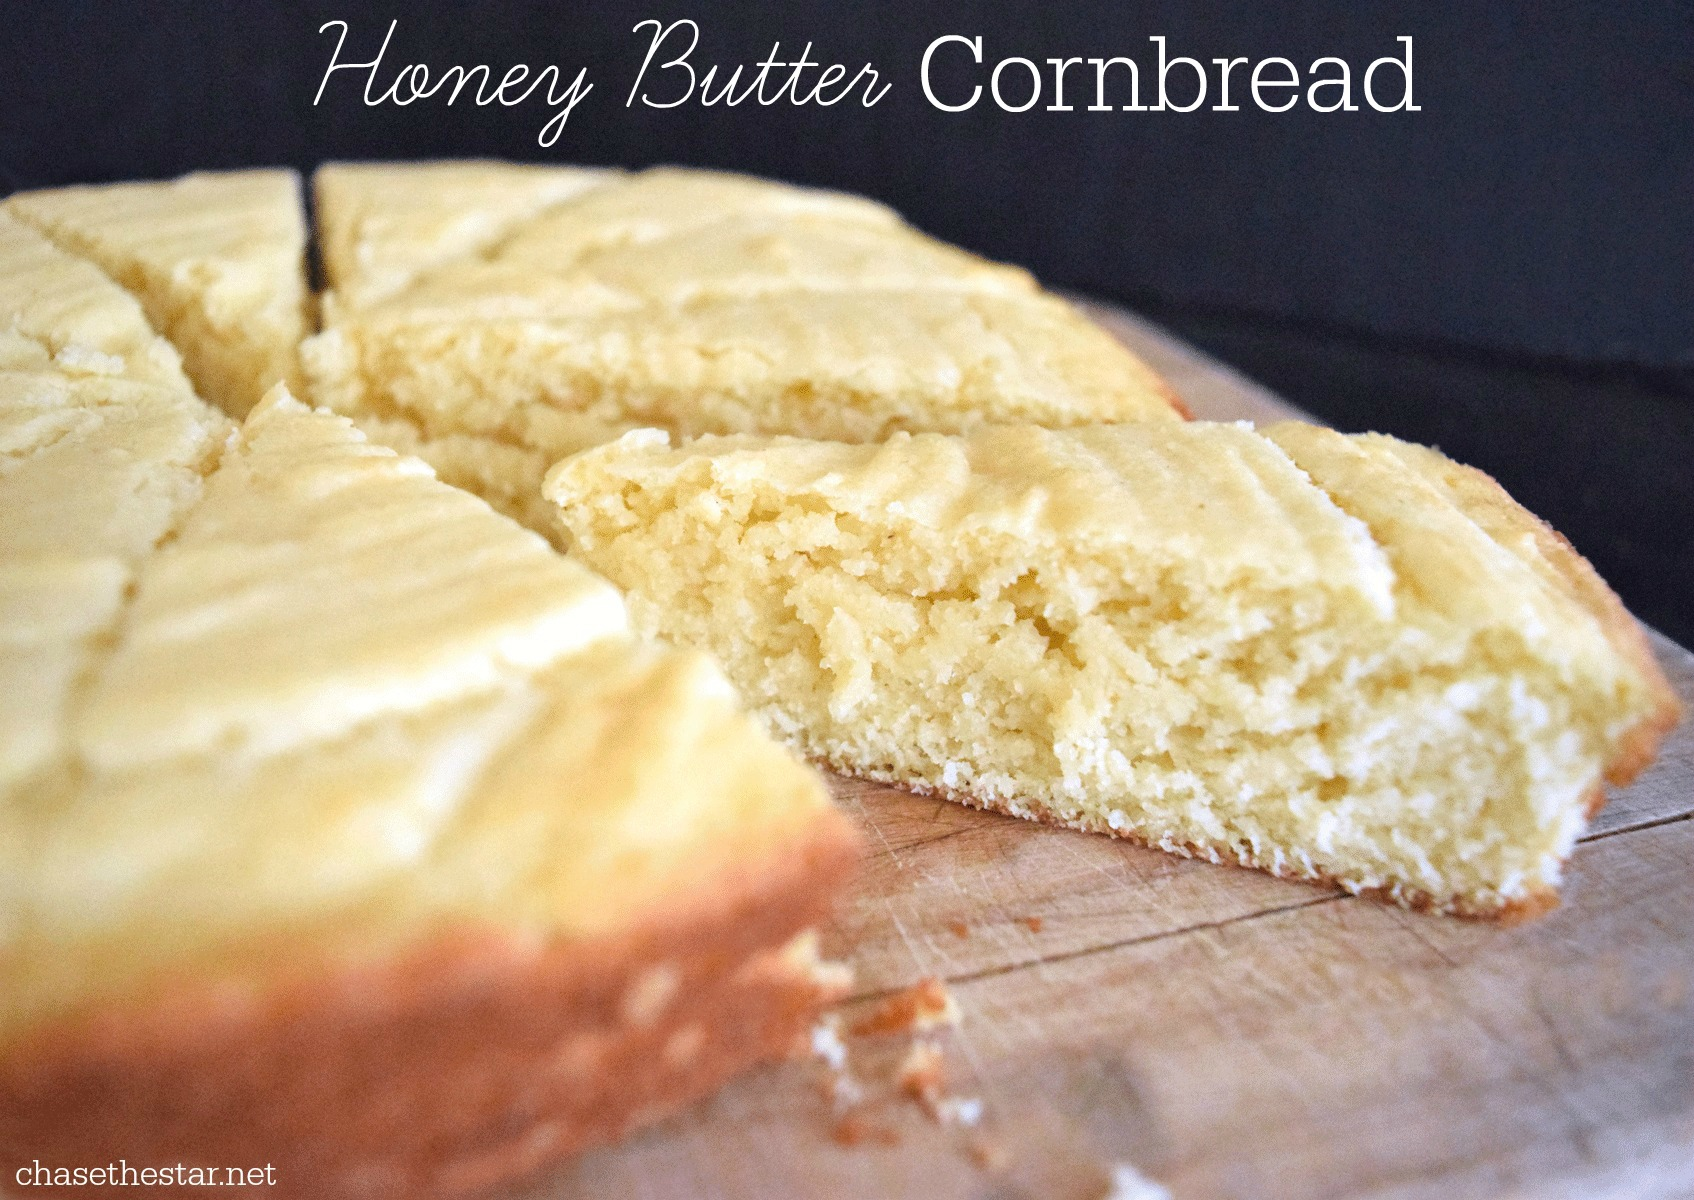 The BEST Cornbread #recipe ever! Honey Butter Cornbread #PanFan #IC #ad